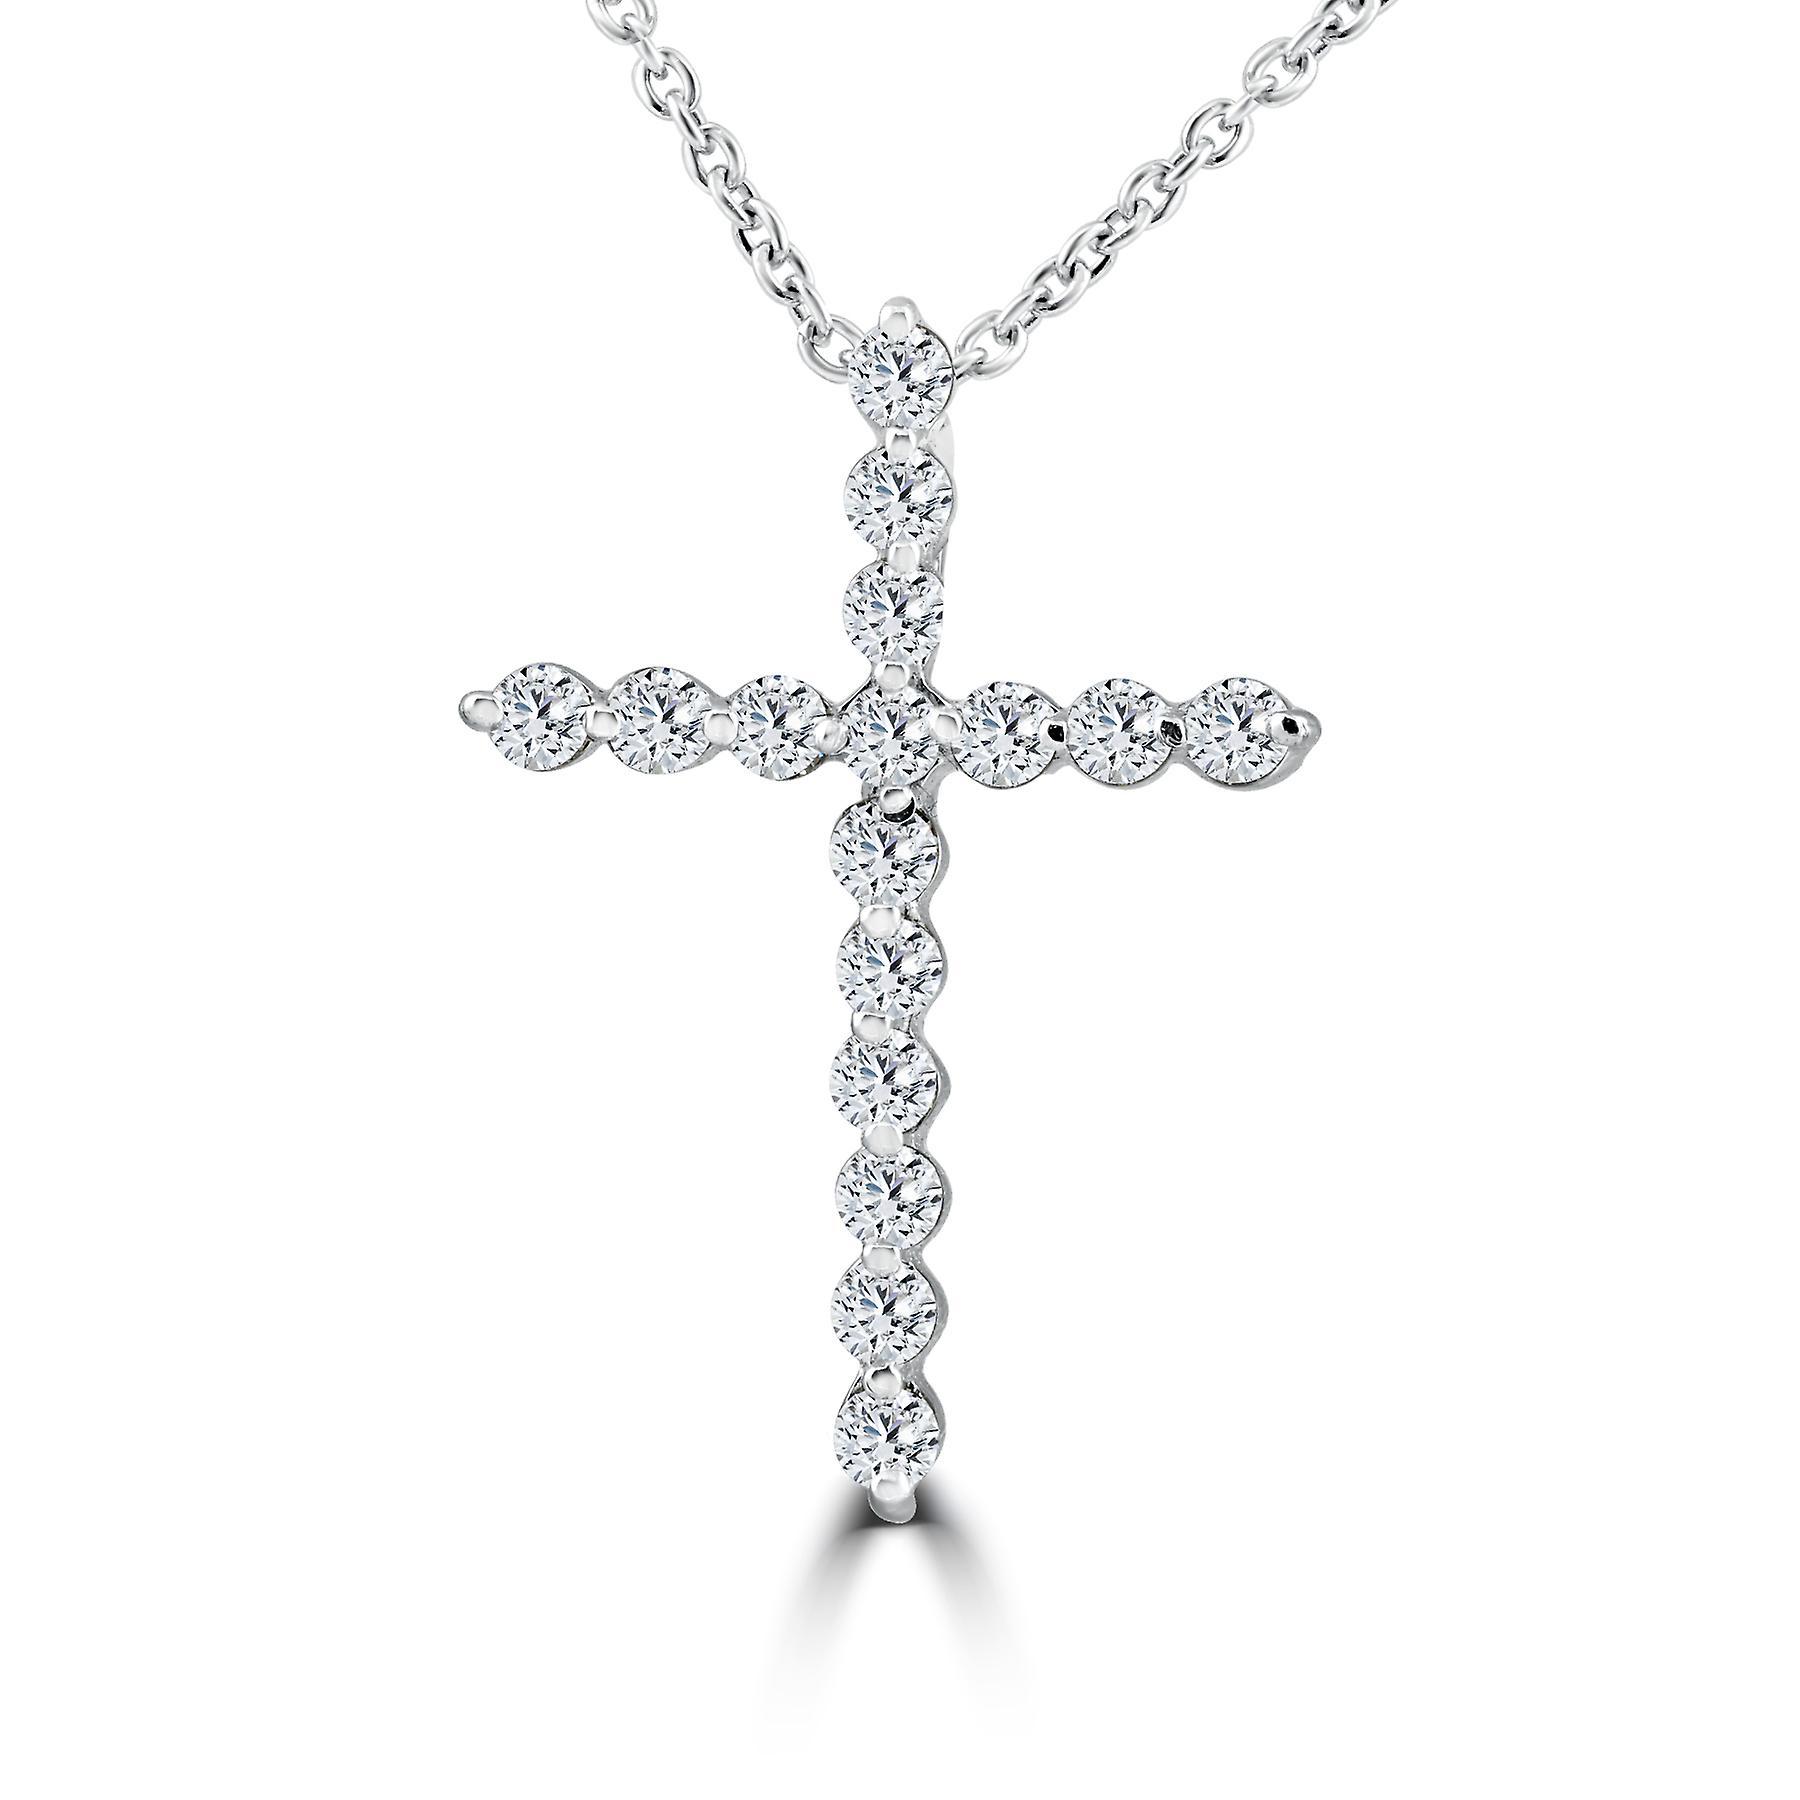 3 8ct Real Diamond Cross Pendant blanc or Necklace